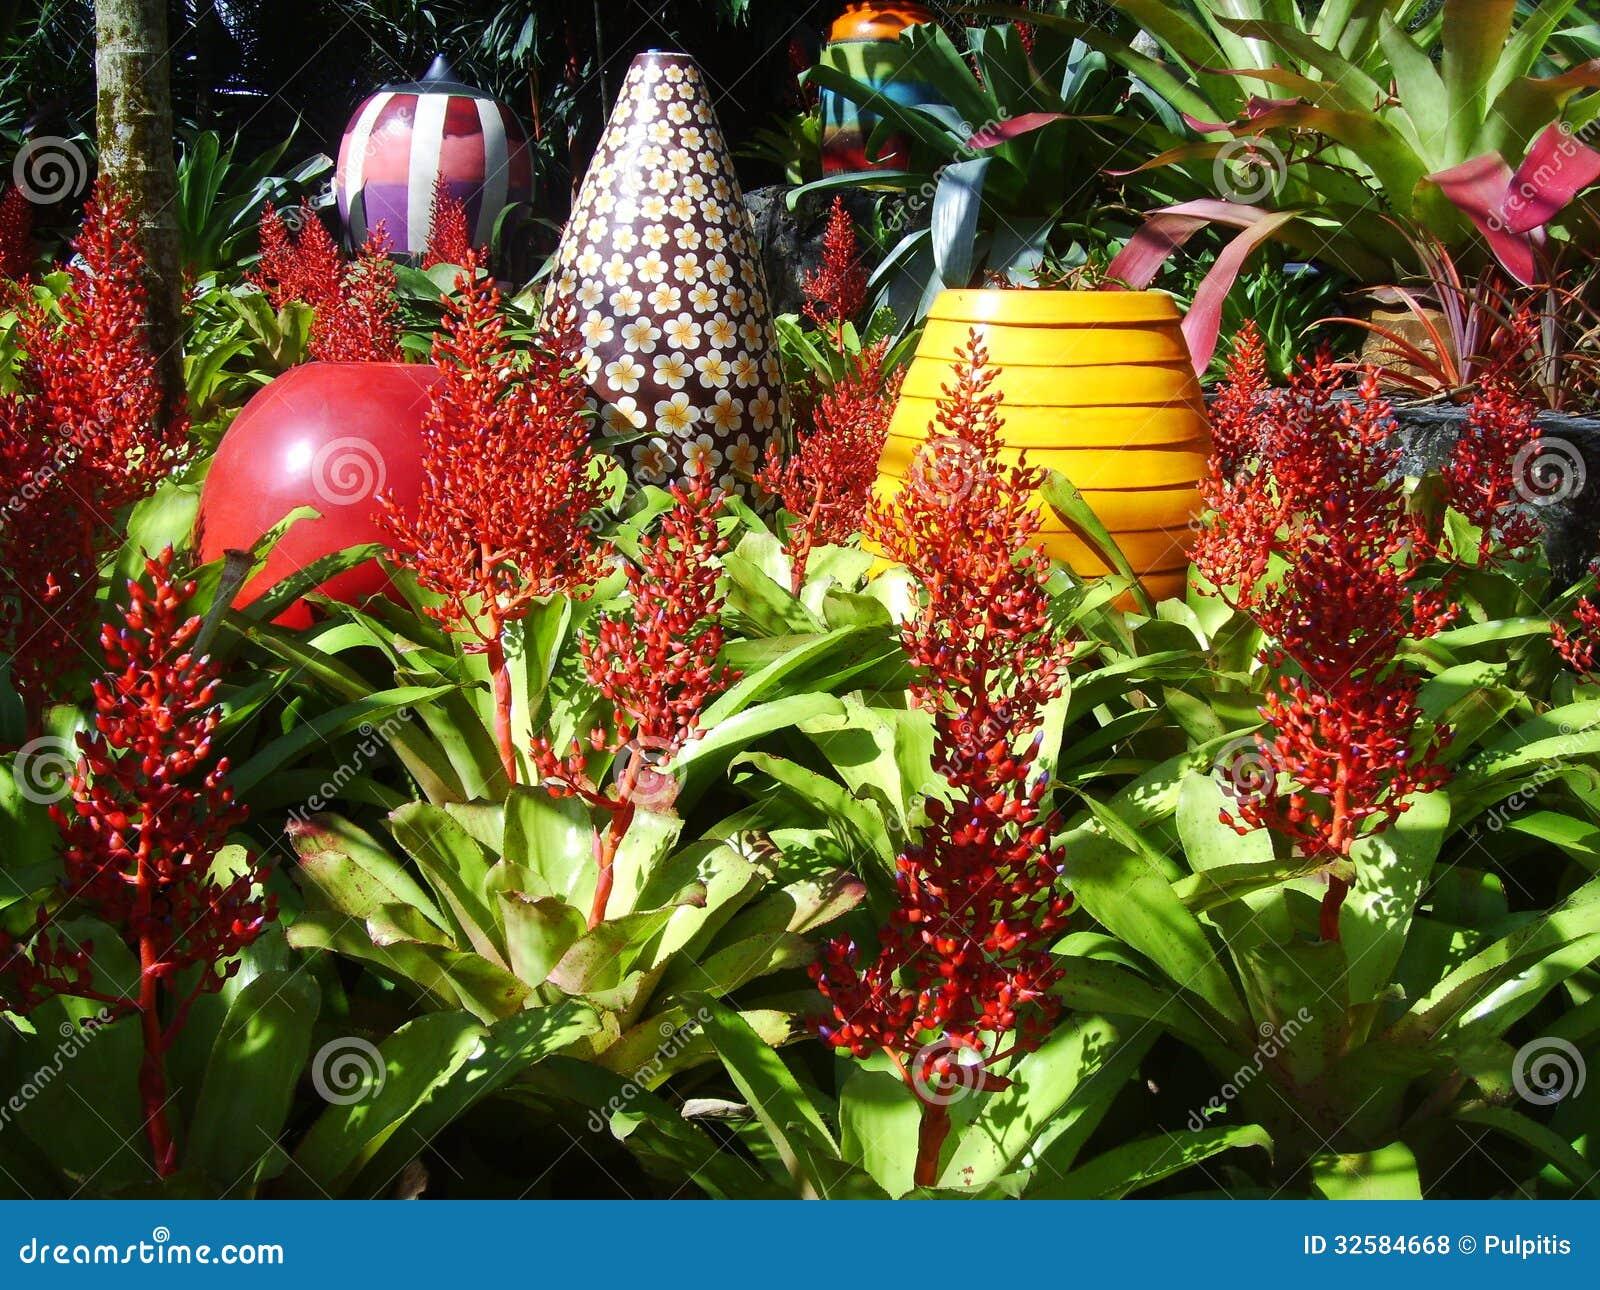 fotos de jardim grande:Vaso Florido Grande Para Decorar Um Jardim Da Bromeliácea Fotos de